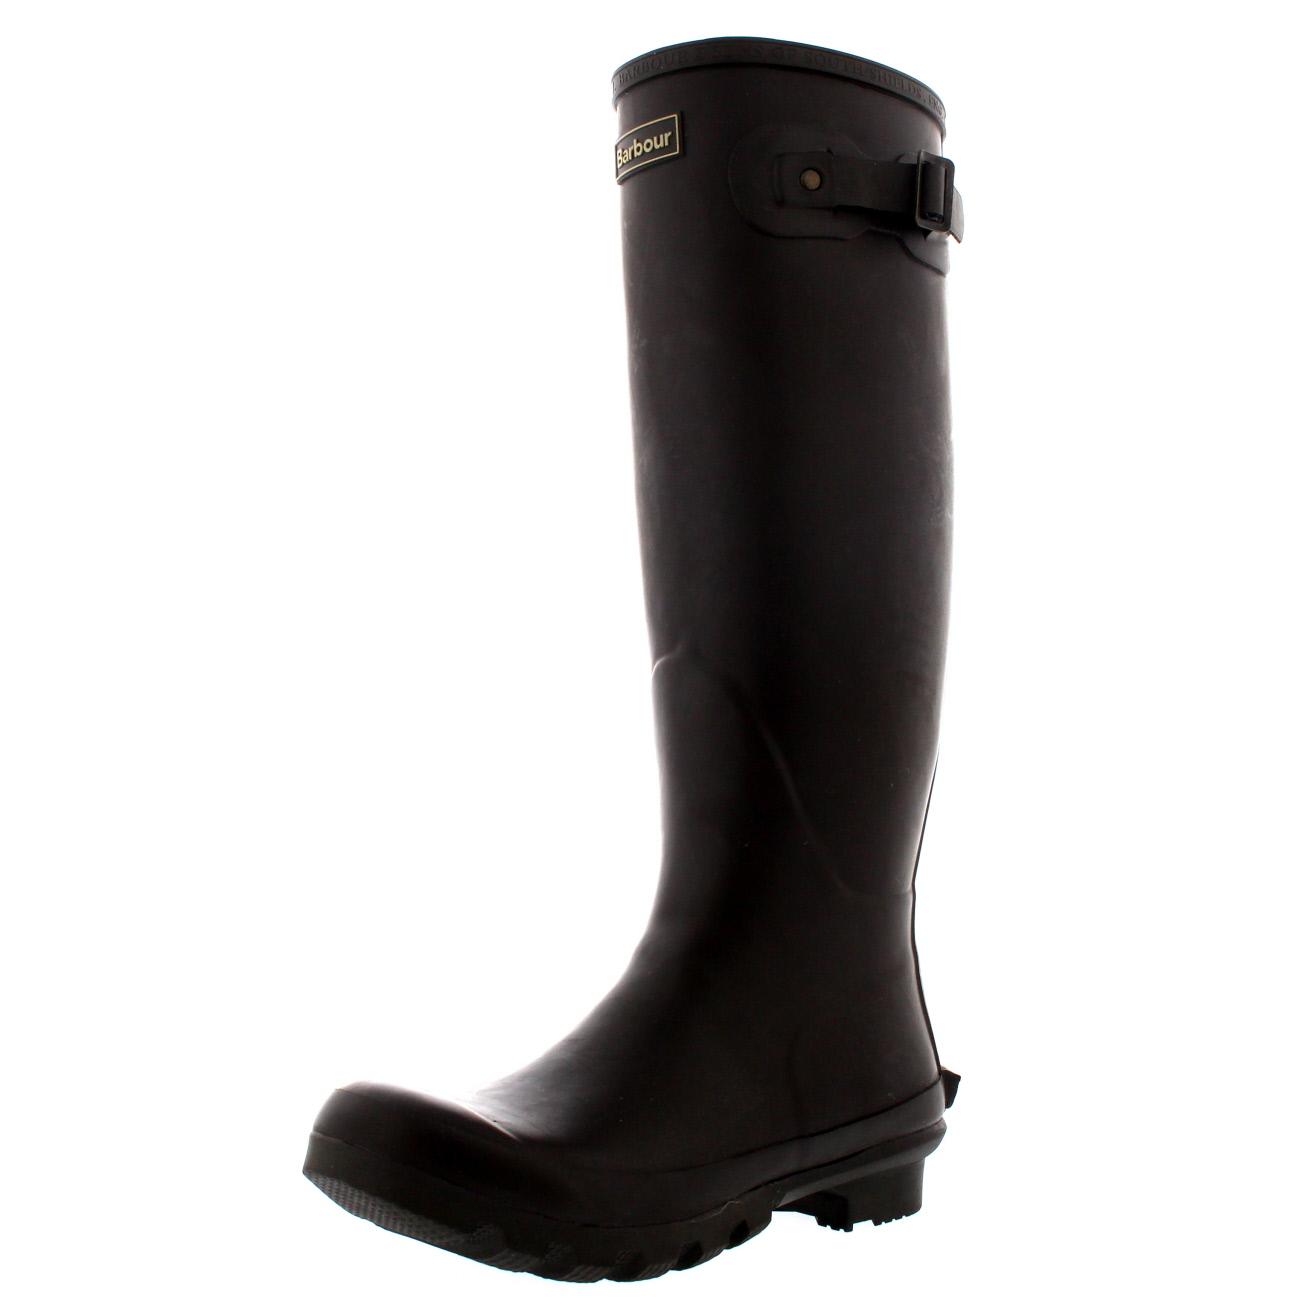 Womens-Barbour-Bede-Snow-Waterproof-Winter-Wellingtons-Mid-Calf-Boots-US-5-11 thumbnail 16